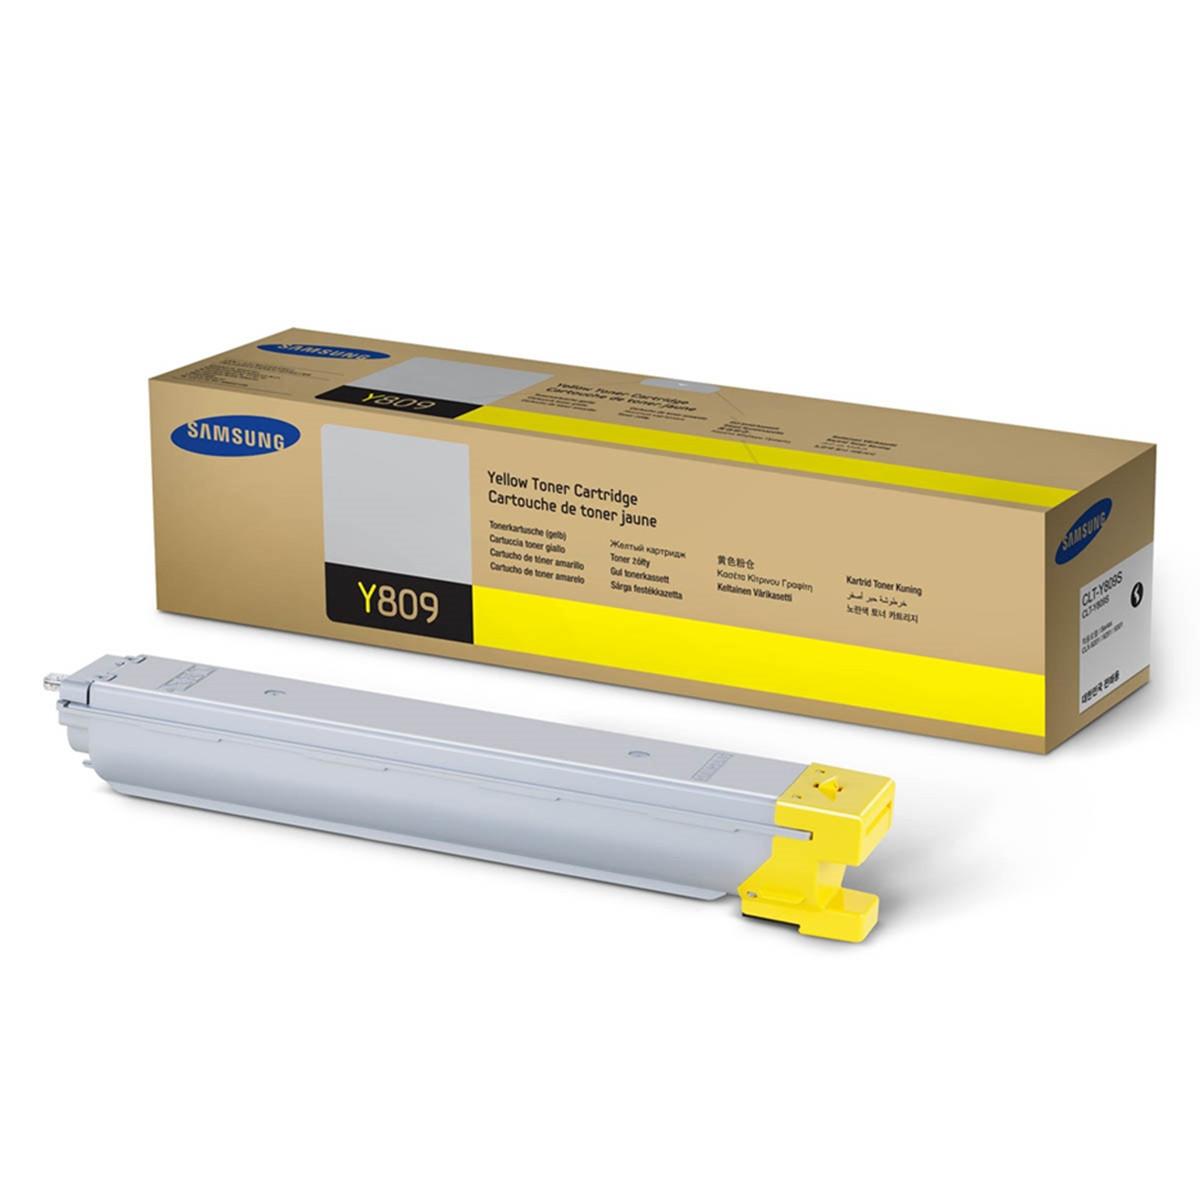 Toner Samsung CLT-Y809S Amarelo | CLX9201NA CLX9201ND CLX9251NA CLX9251ND CLX9301NA | Original 15k